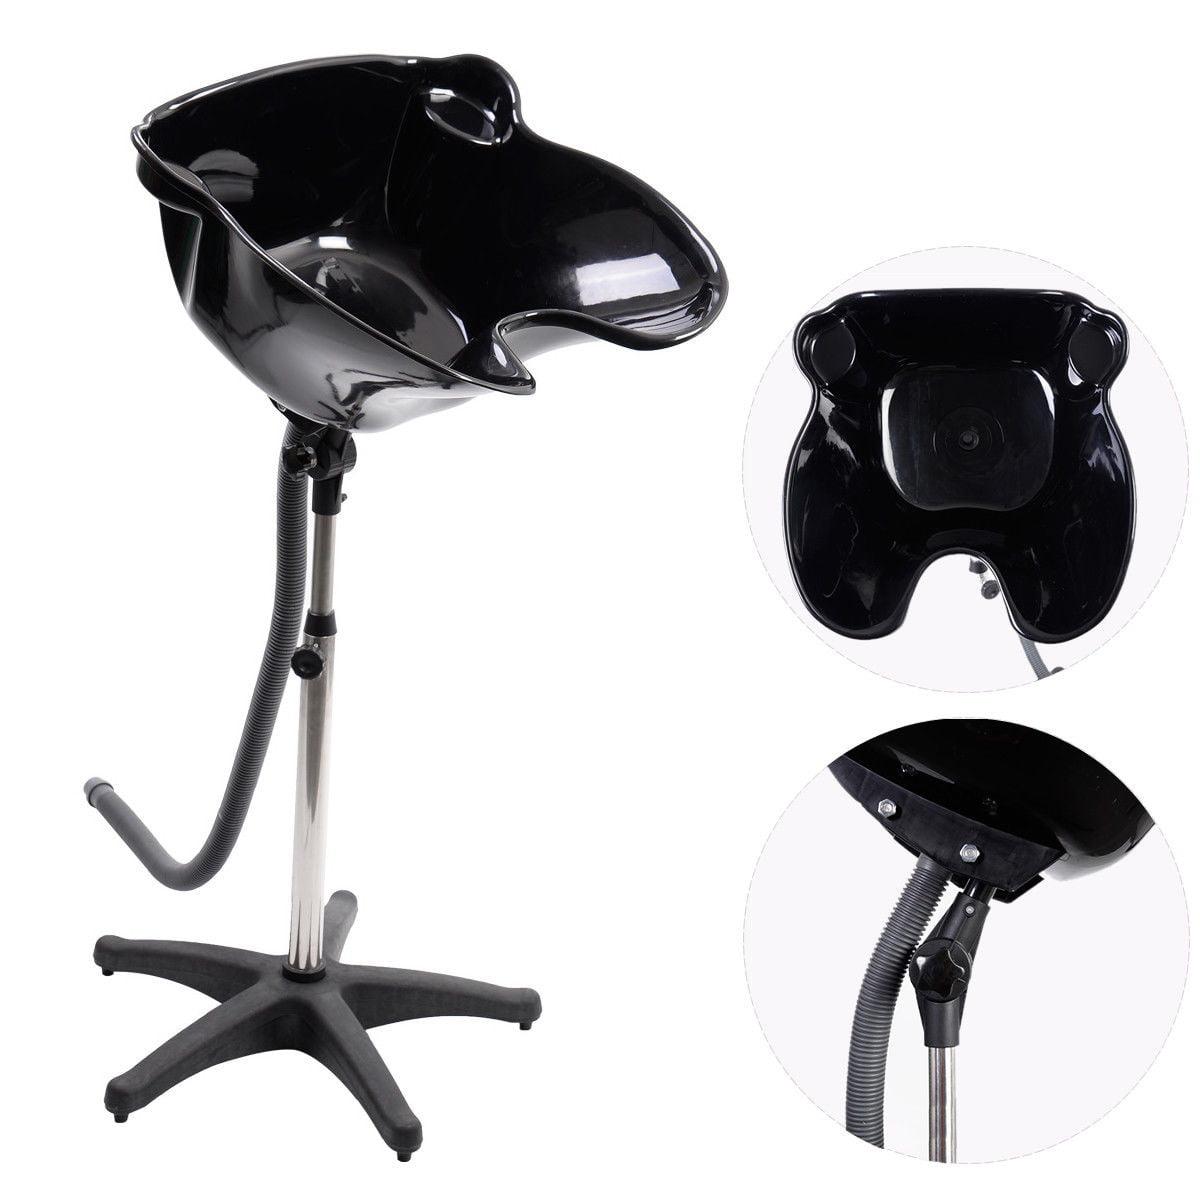 Pro Portable Shampoo Basin Height Adjustable Salon Hair Treatment Bowl by Costway